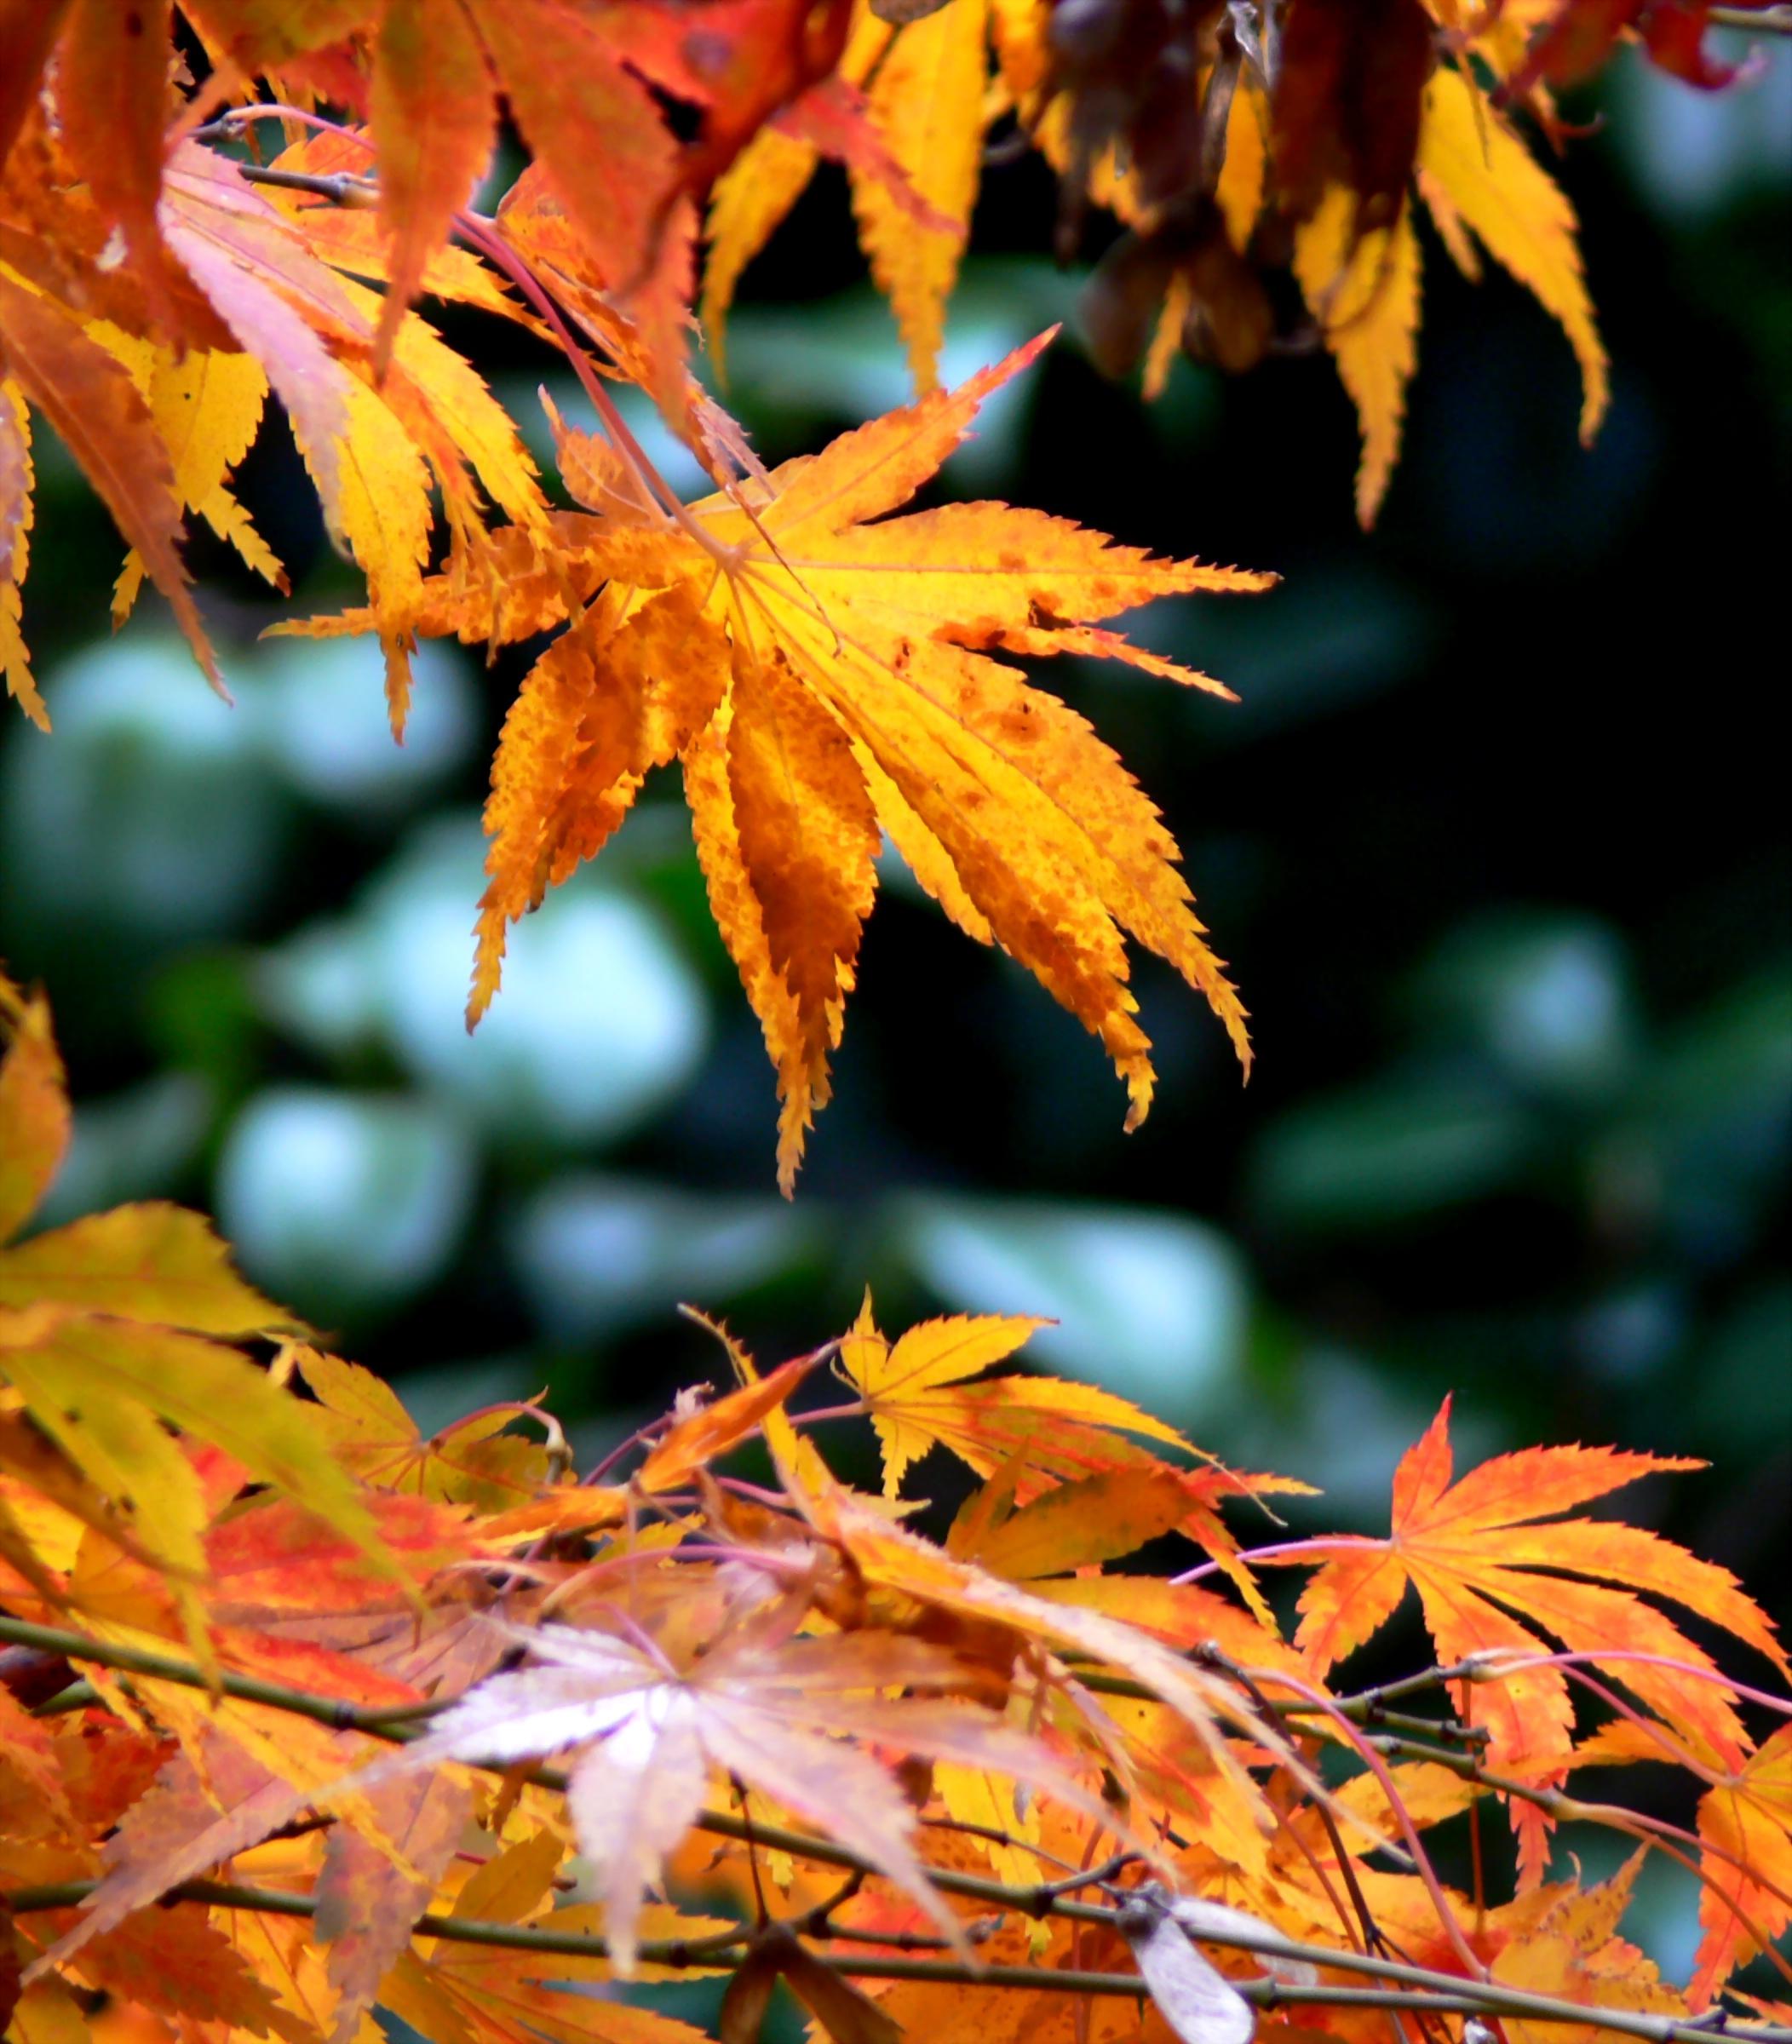 Autumn Leoanrdslee.jpg